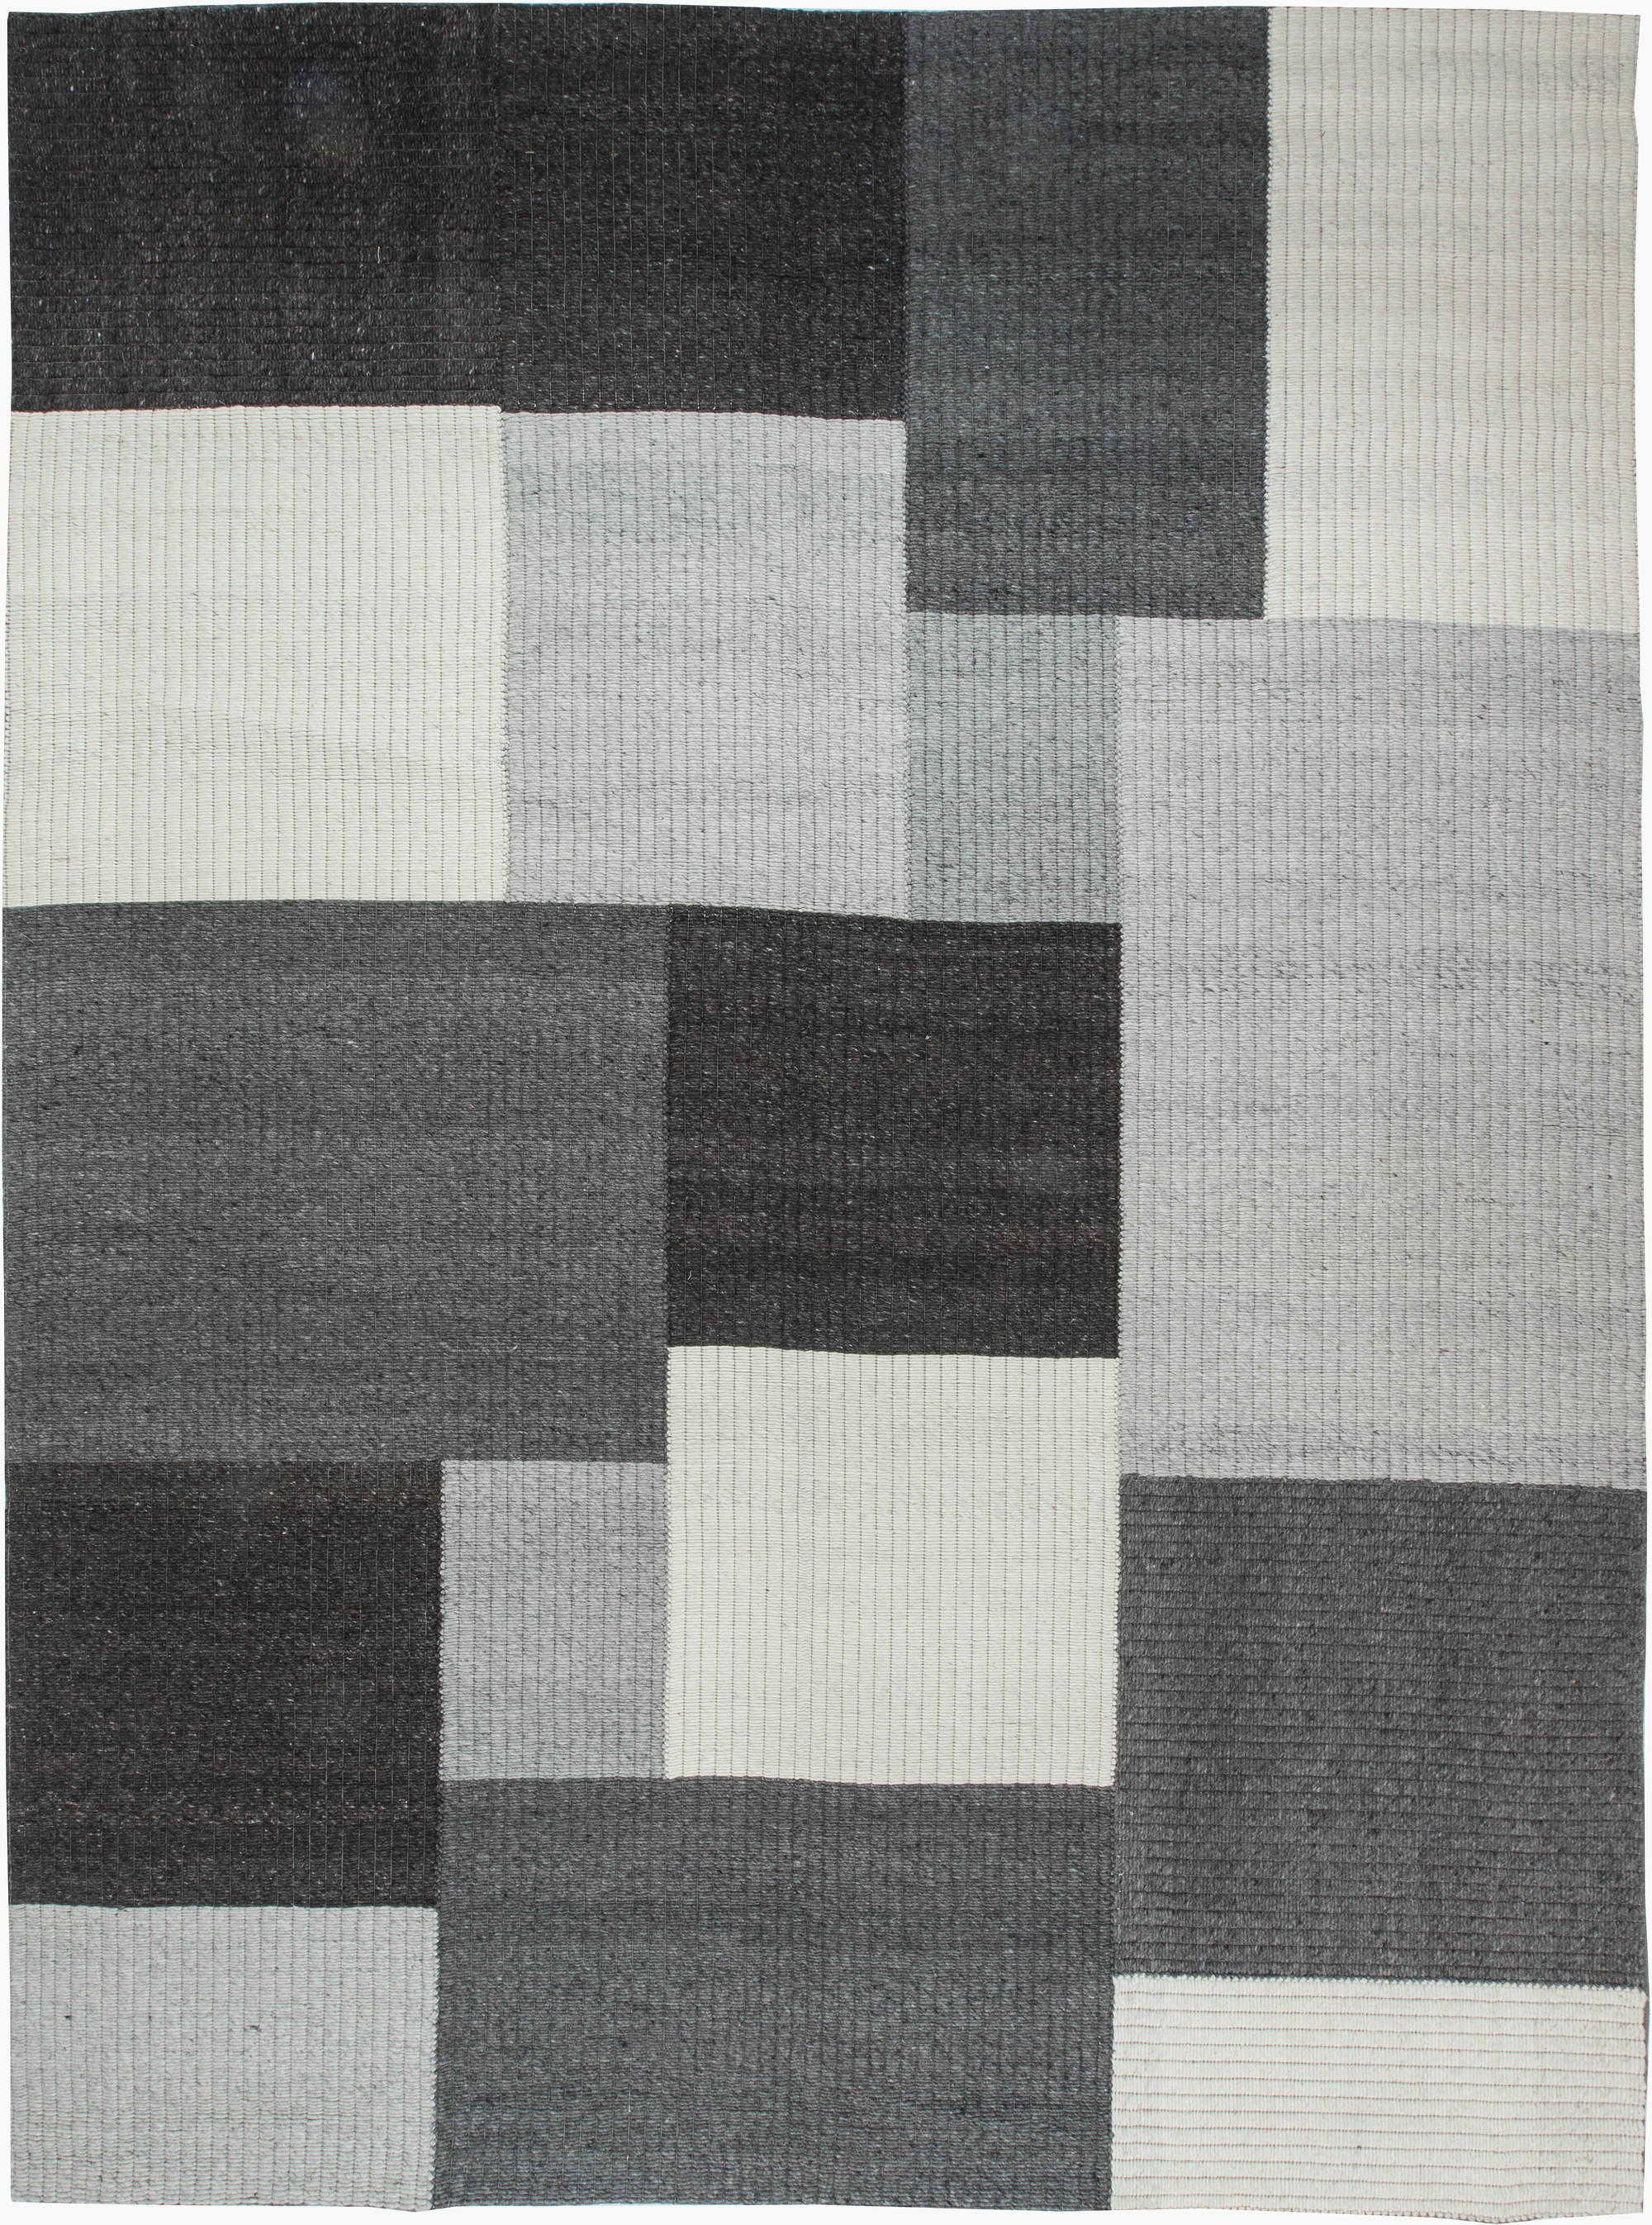 contemporary carpets modern flat weave carpet n11587. arrow down  47161db02bae4ef92bdede423862e8f0c2b91f81311572b5a8bb90eef3001a34 XNEAVWU